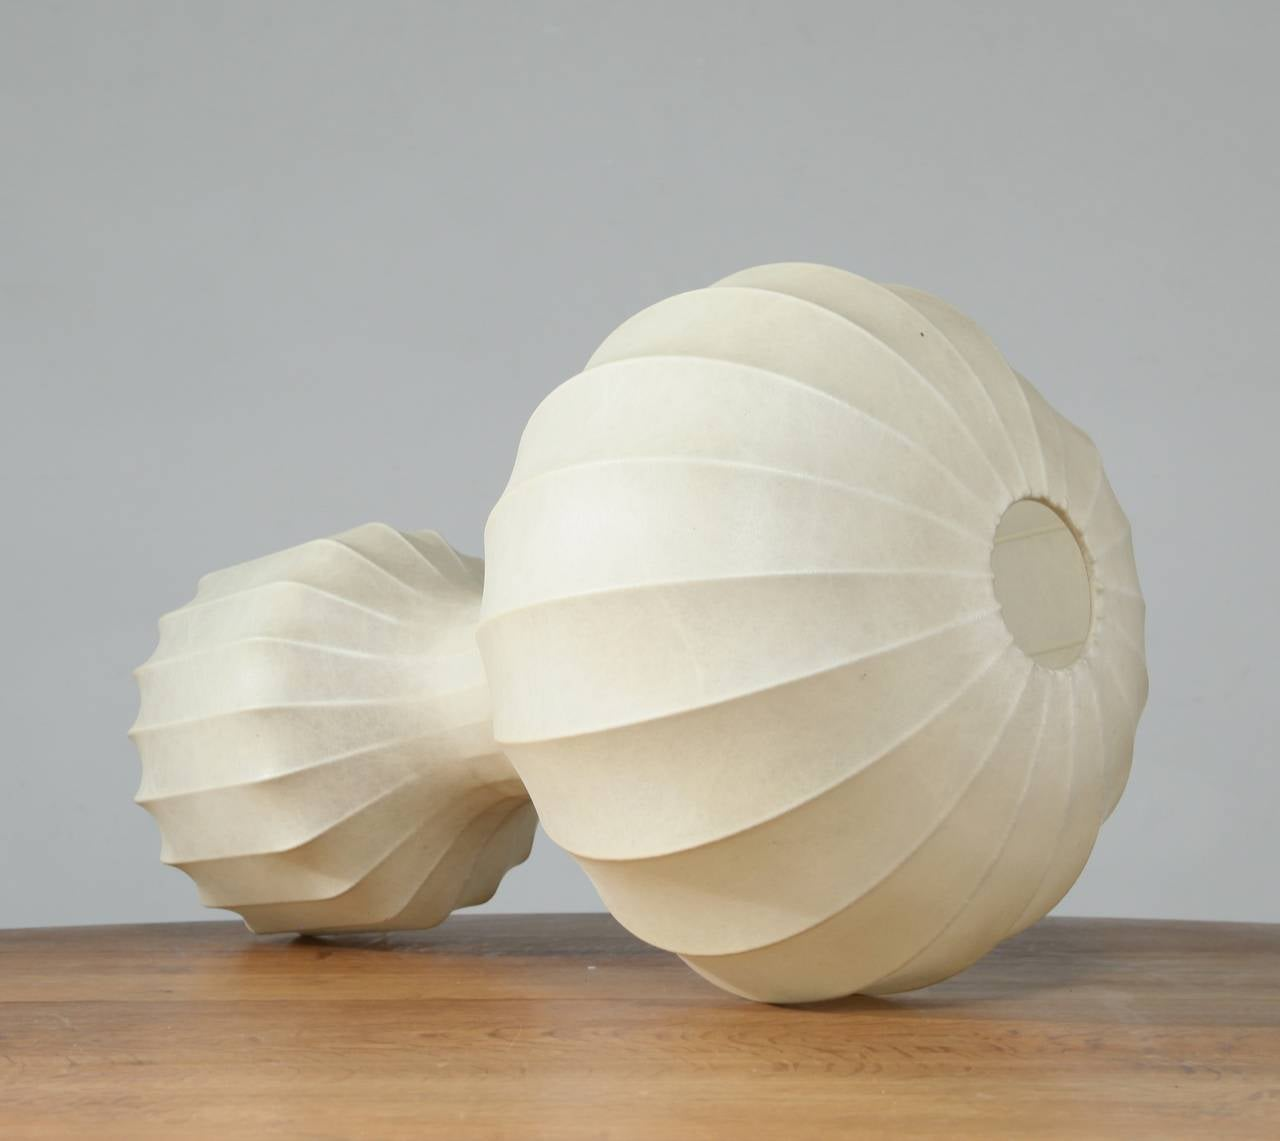 Giacomo Castiglioni 'Gatto' table lamp for Flos at 1stdibs